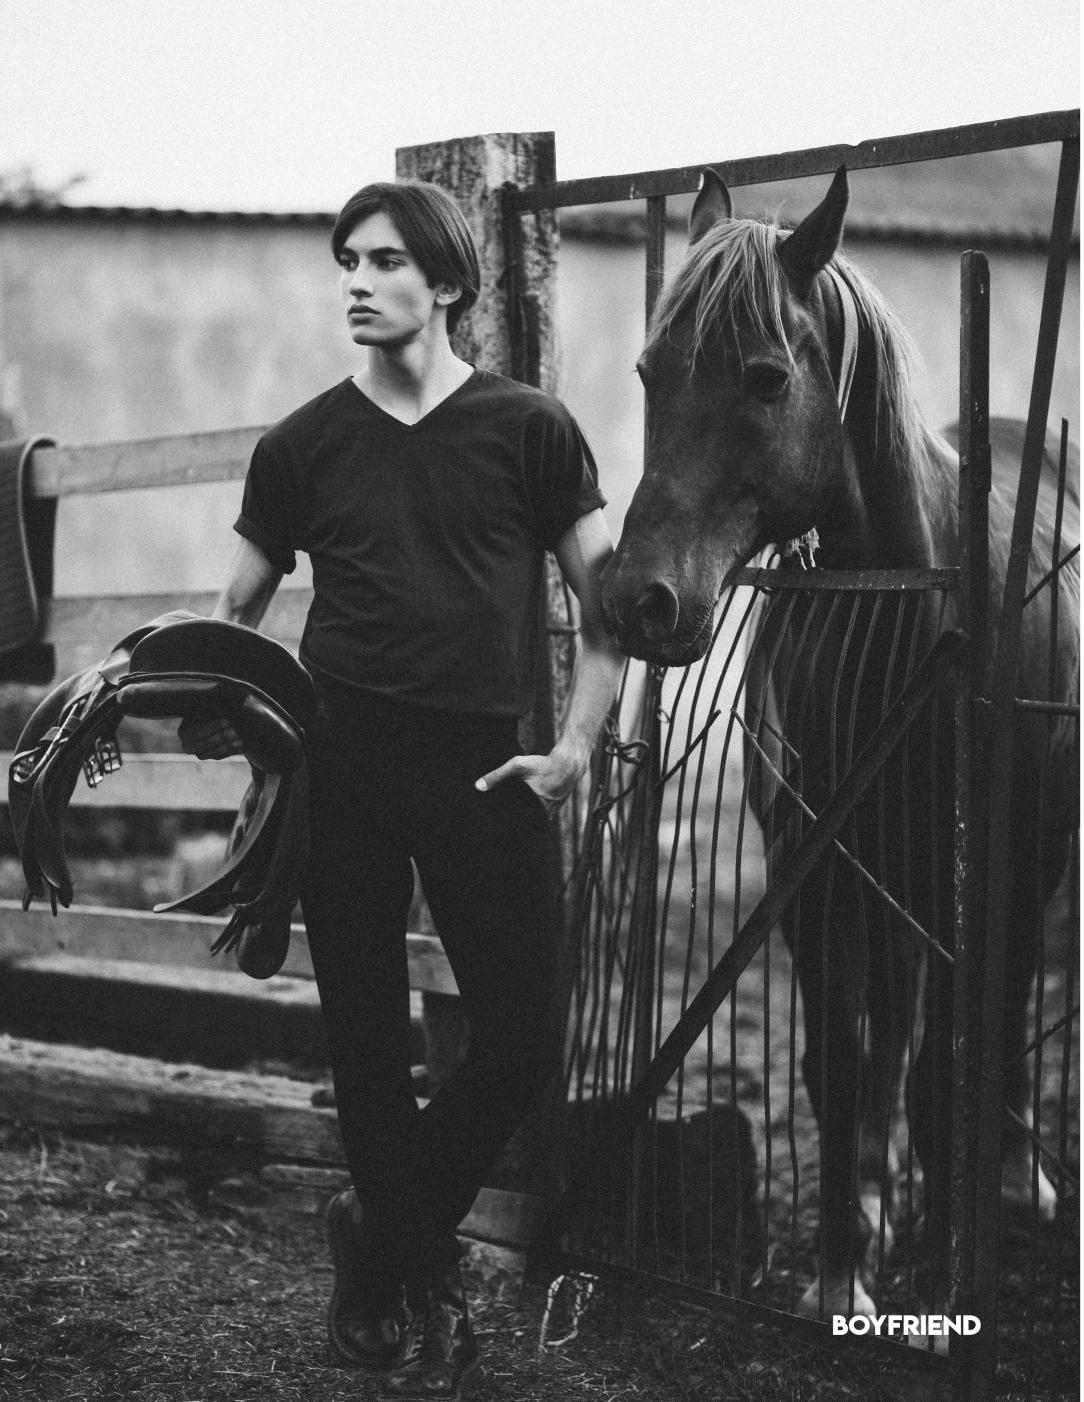 Boyfriend Mag - July 2018 - Only the Horses - Julia Chernigina5